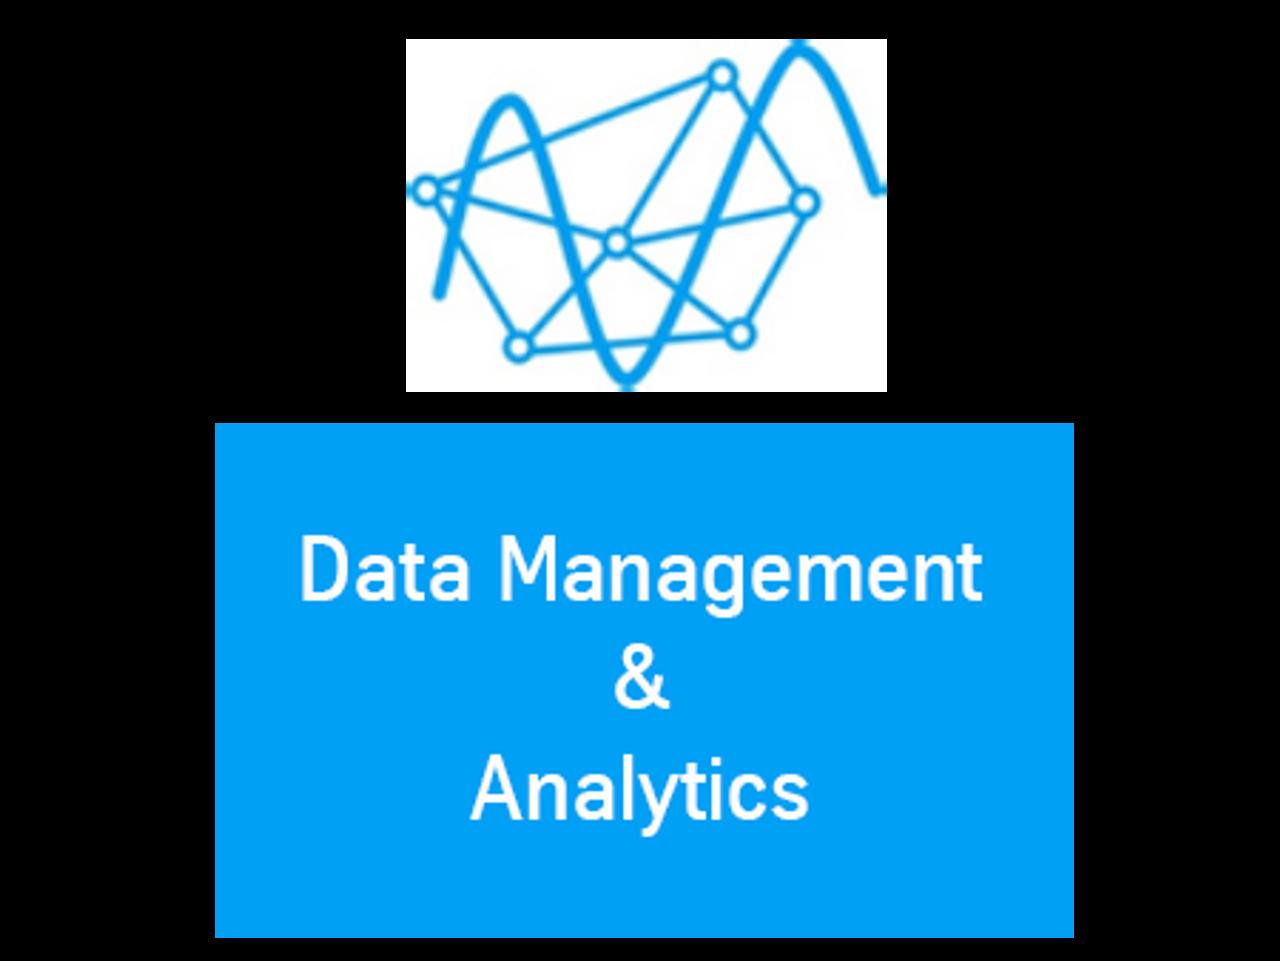 Data Management & Analytics thyssenkrupp automation engineering